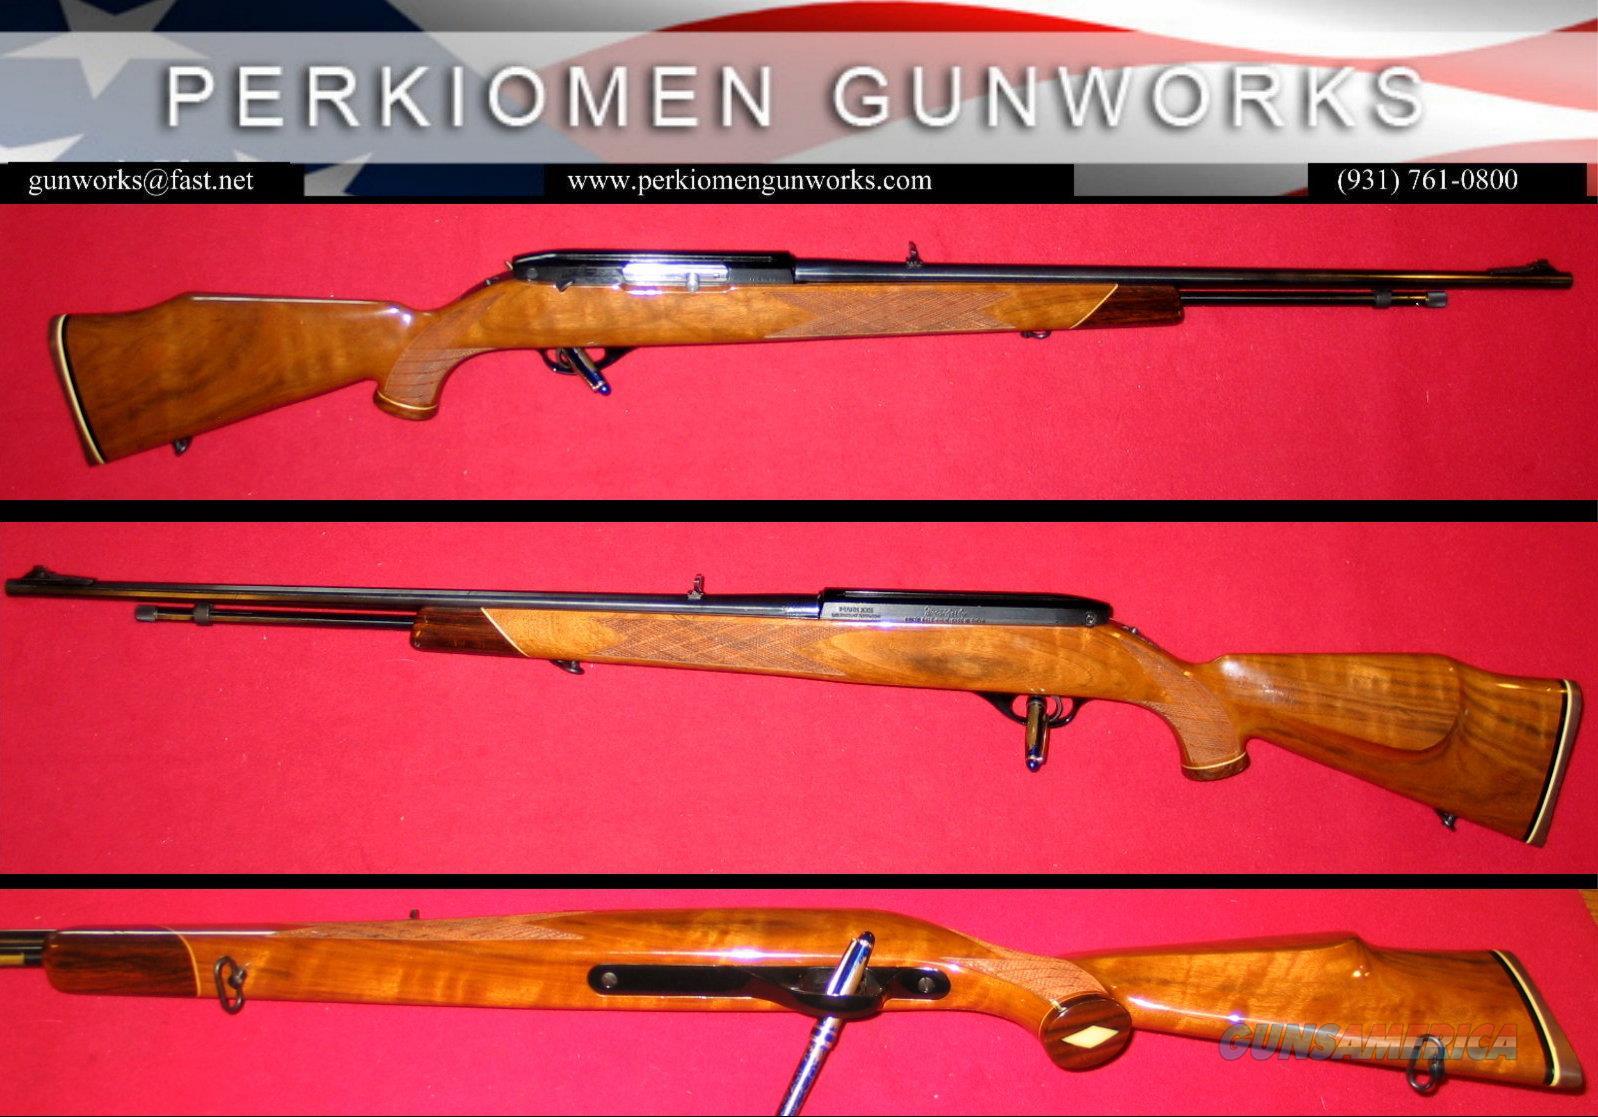 Mark XXII semi-auto, tube feed, .22LR  Guns > Rifles > Weatherby Rifles > Sporting